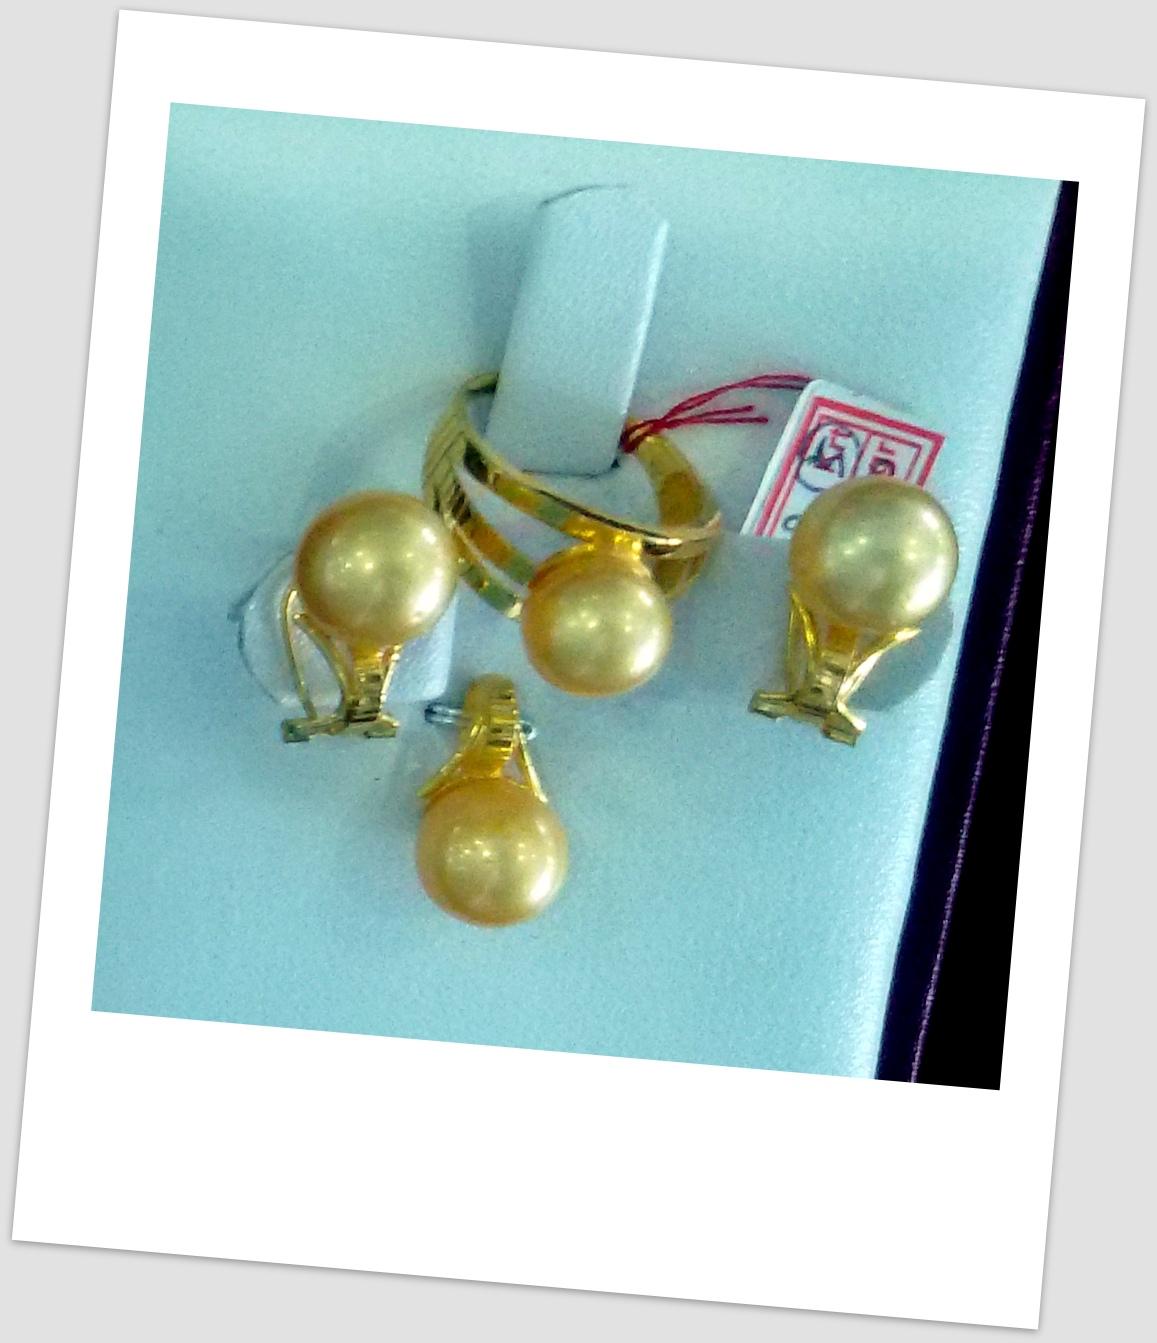 Langkah Sederhana Membedakan Emas Asli dan Palsu